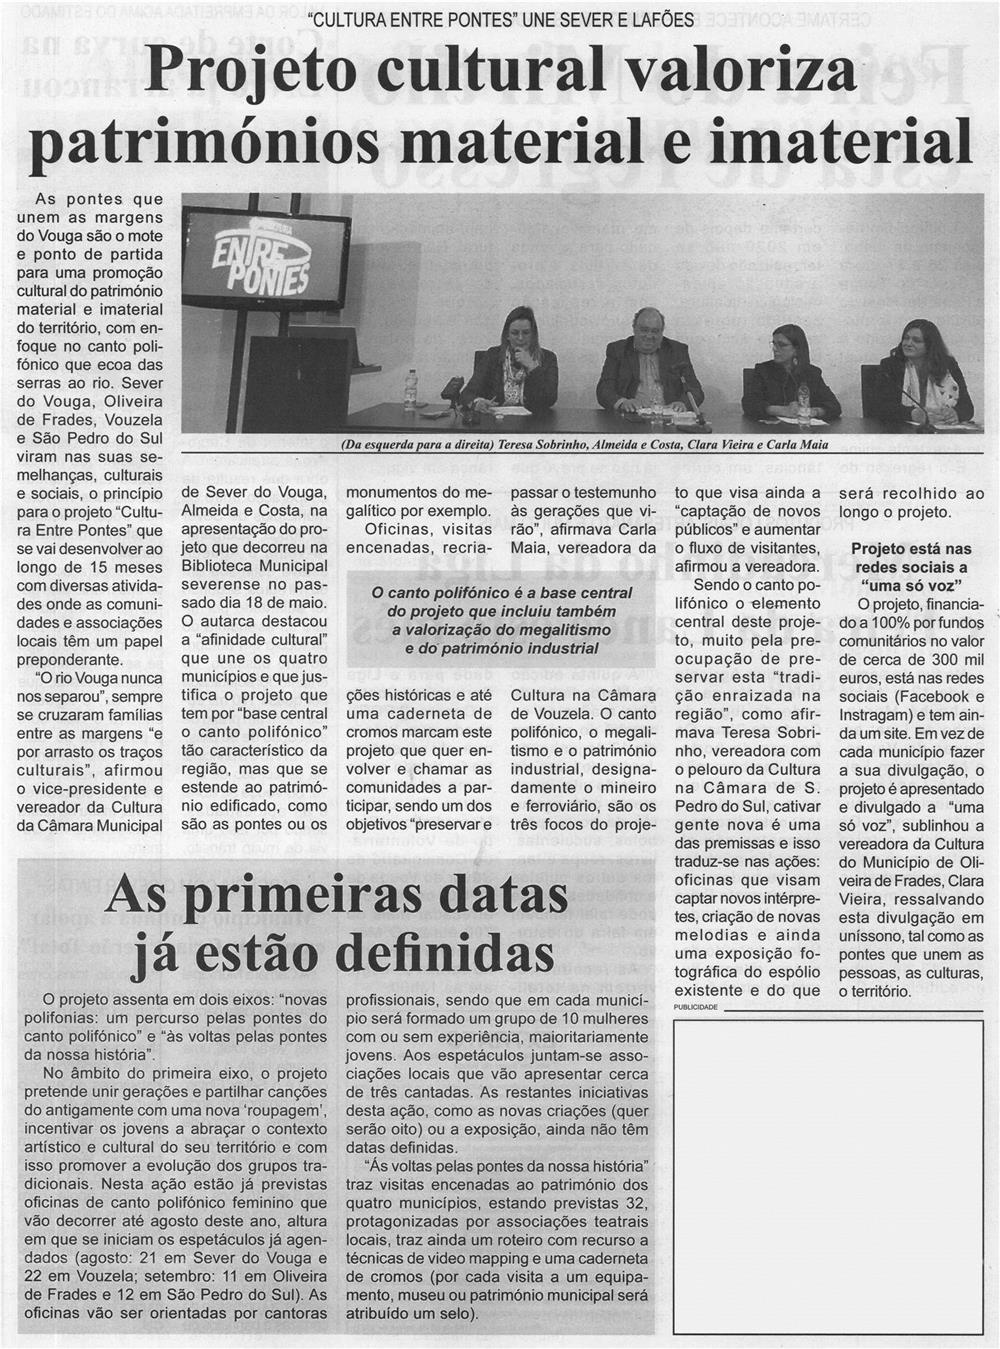 BV-1.ªjun.'21-p.7-Cultura Entre Pontes une Sever e Lafões : projeto cultural valoriza patrimónios material e imaterial.jpg